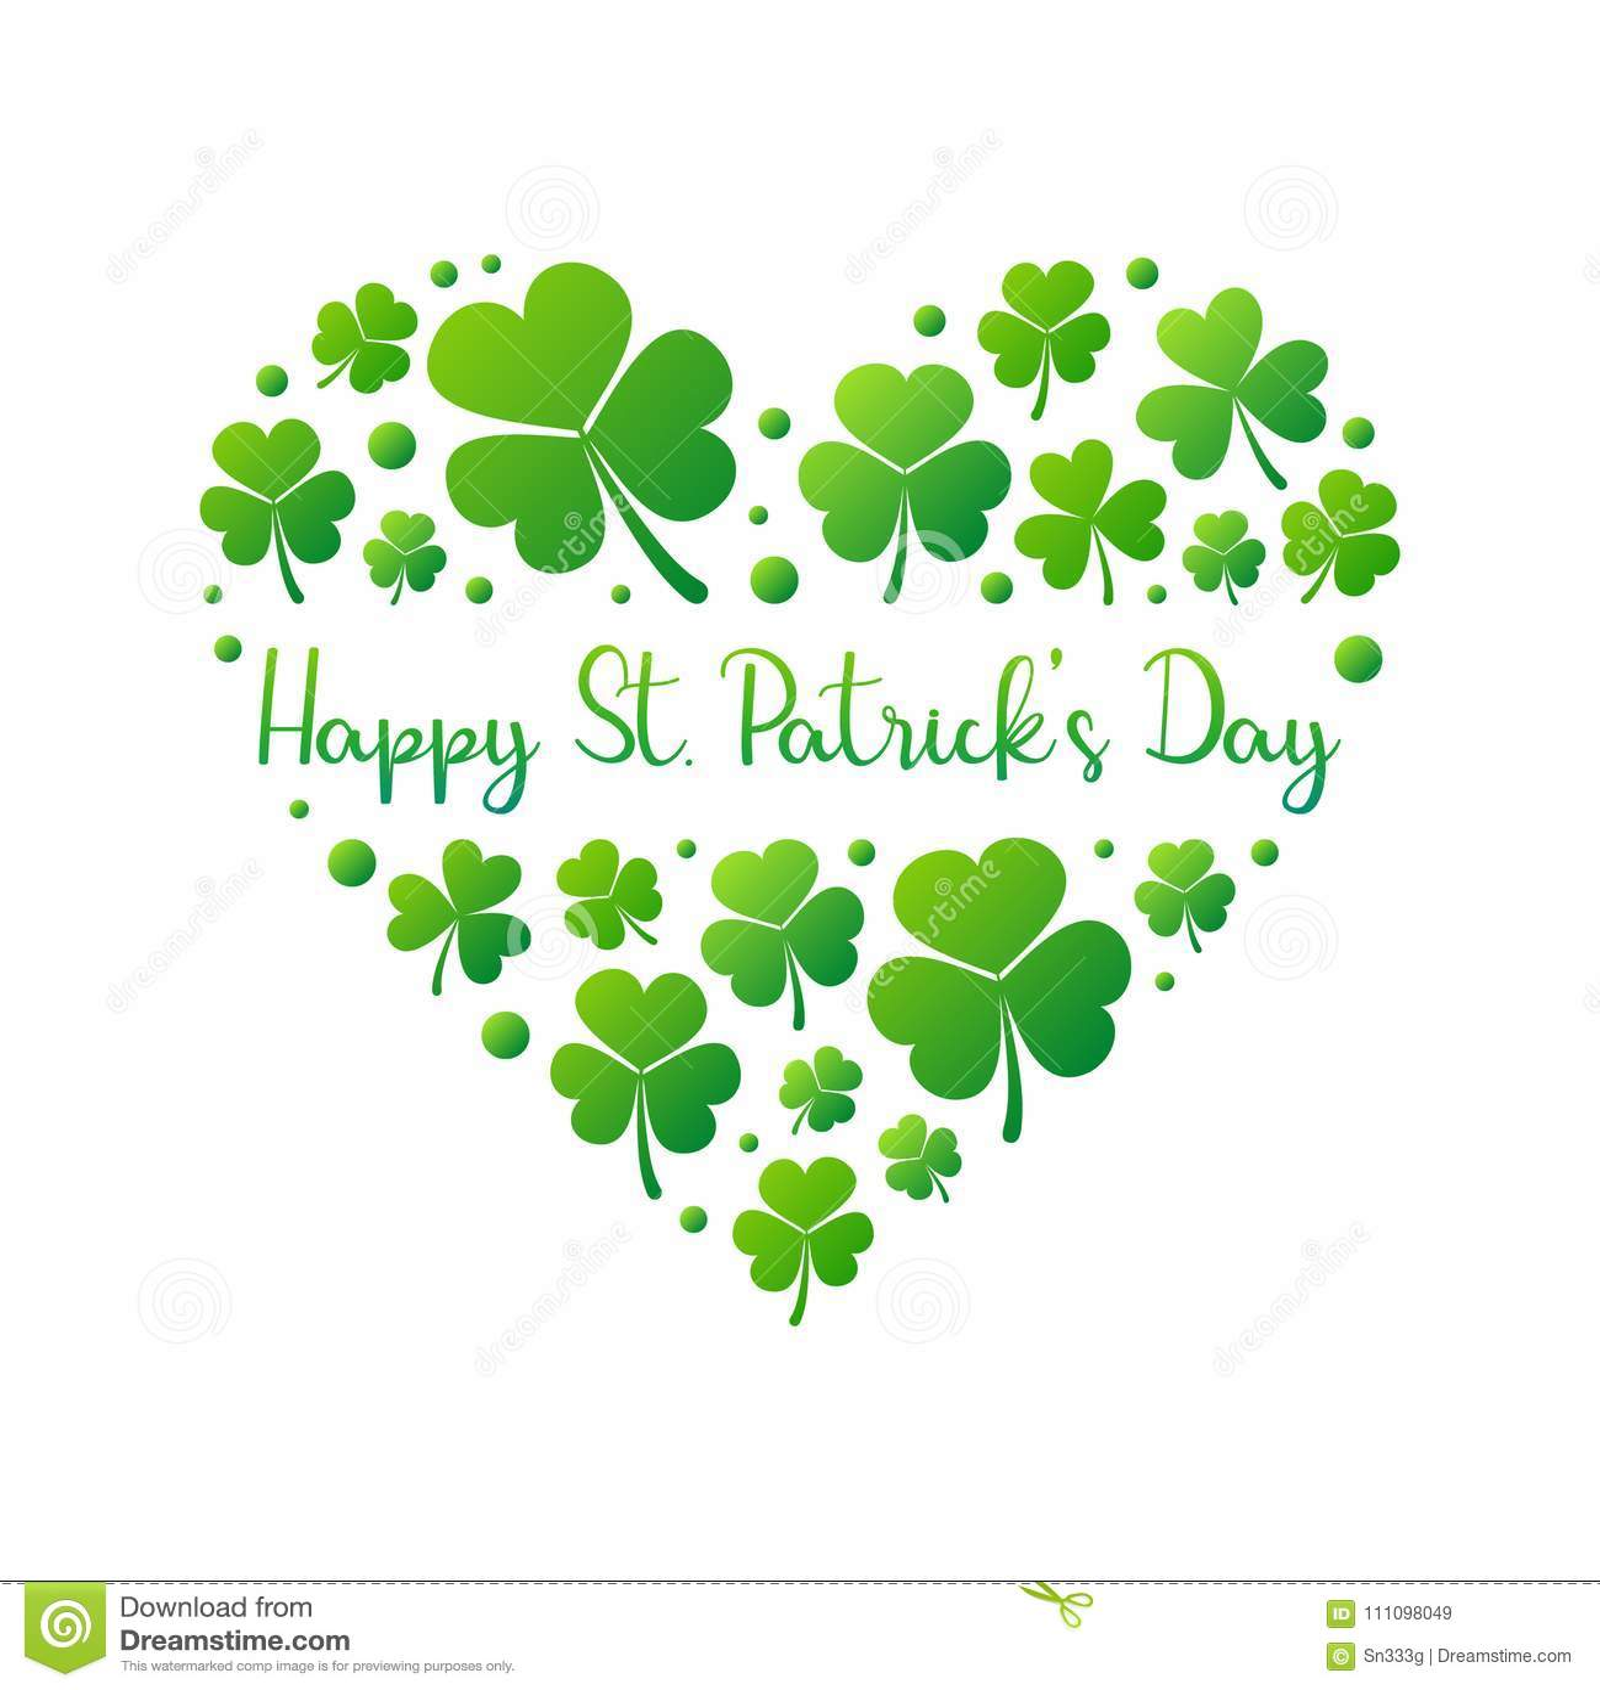 e390026a Happy St. Patricks Day heart made of bright green small shamrocks or  clovers on white background. Vector irish shamrock illustration